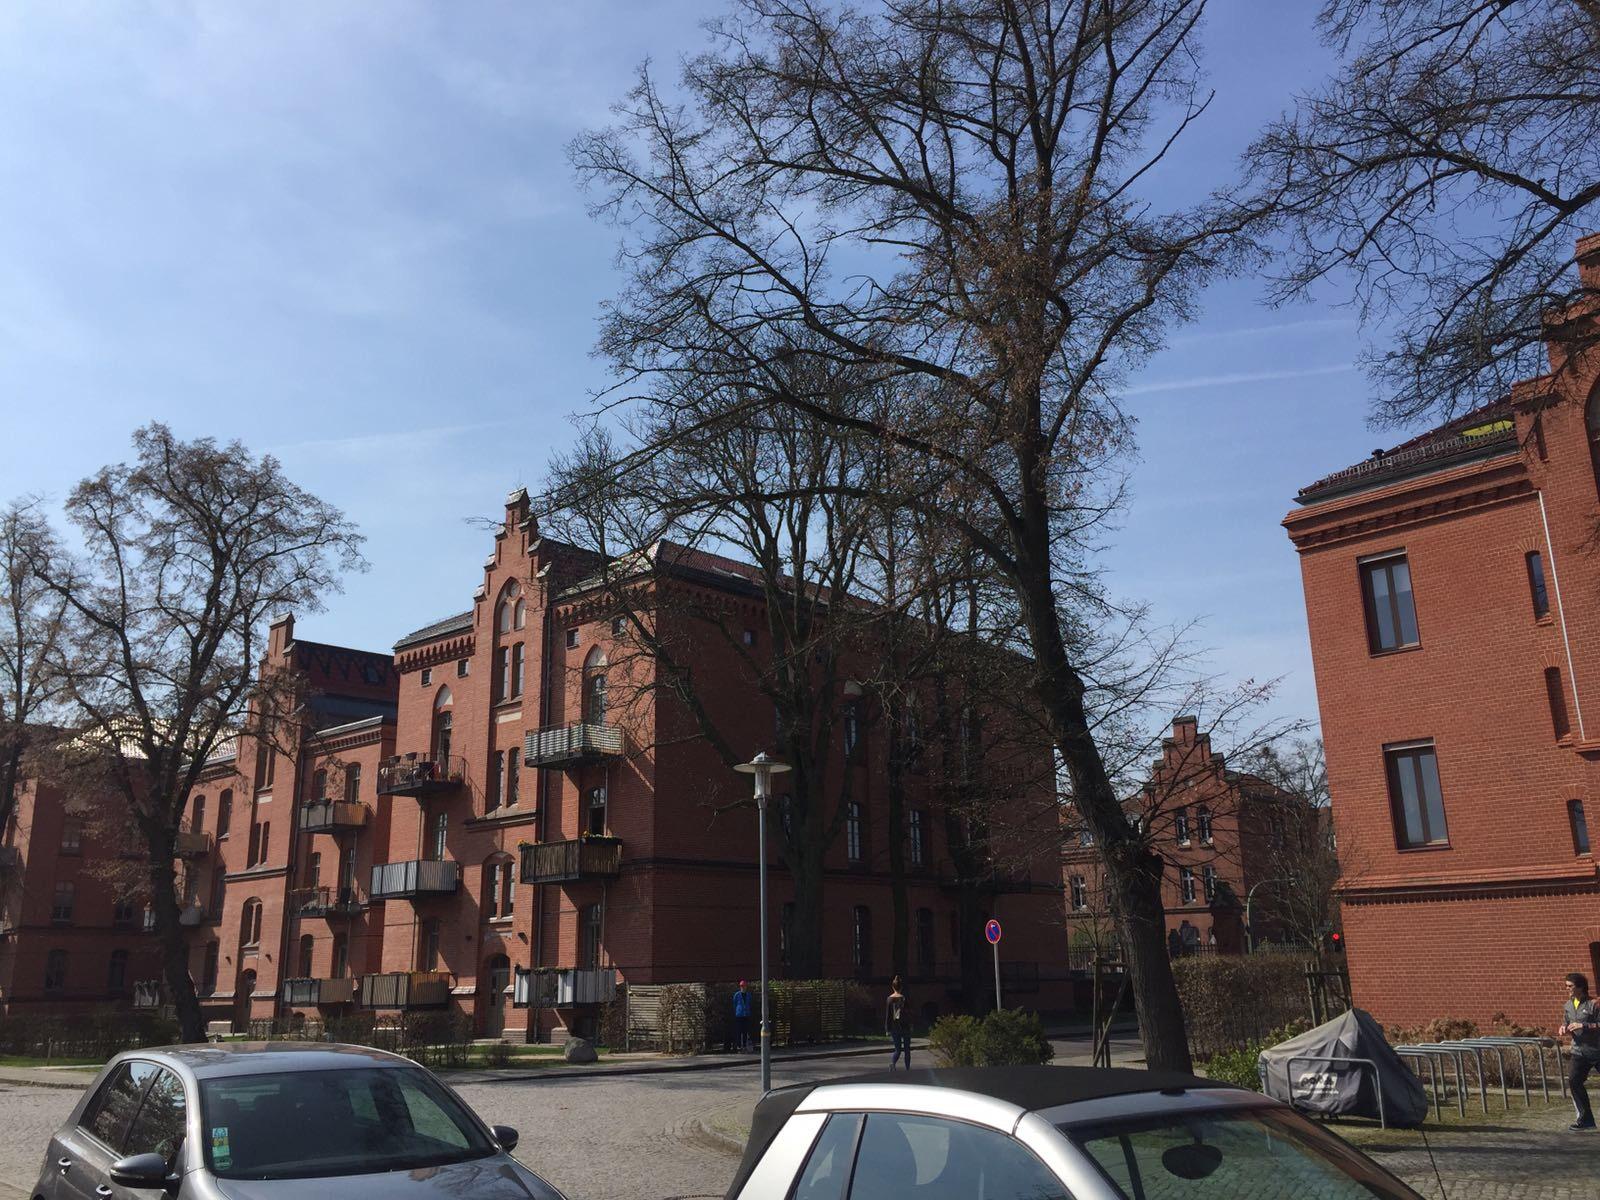 Rote Kasernen in Potsdam (Denkmalsanierung)